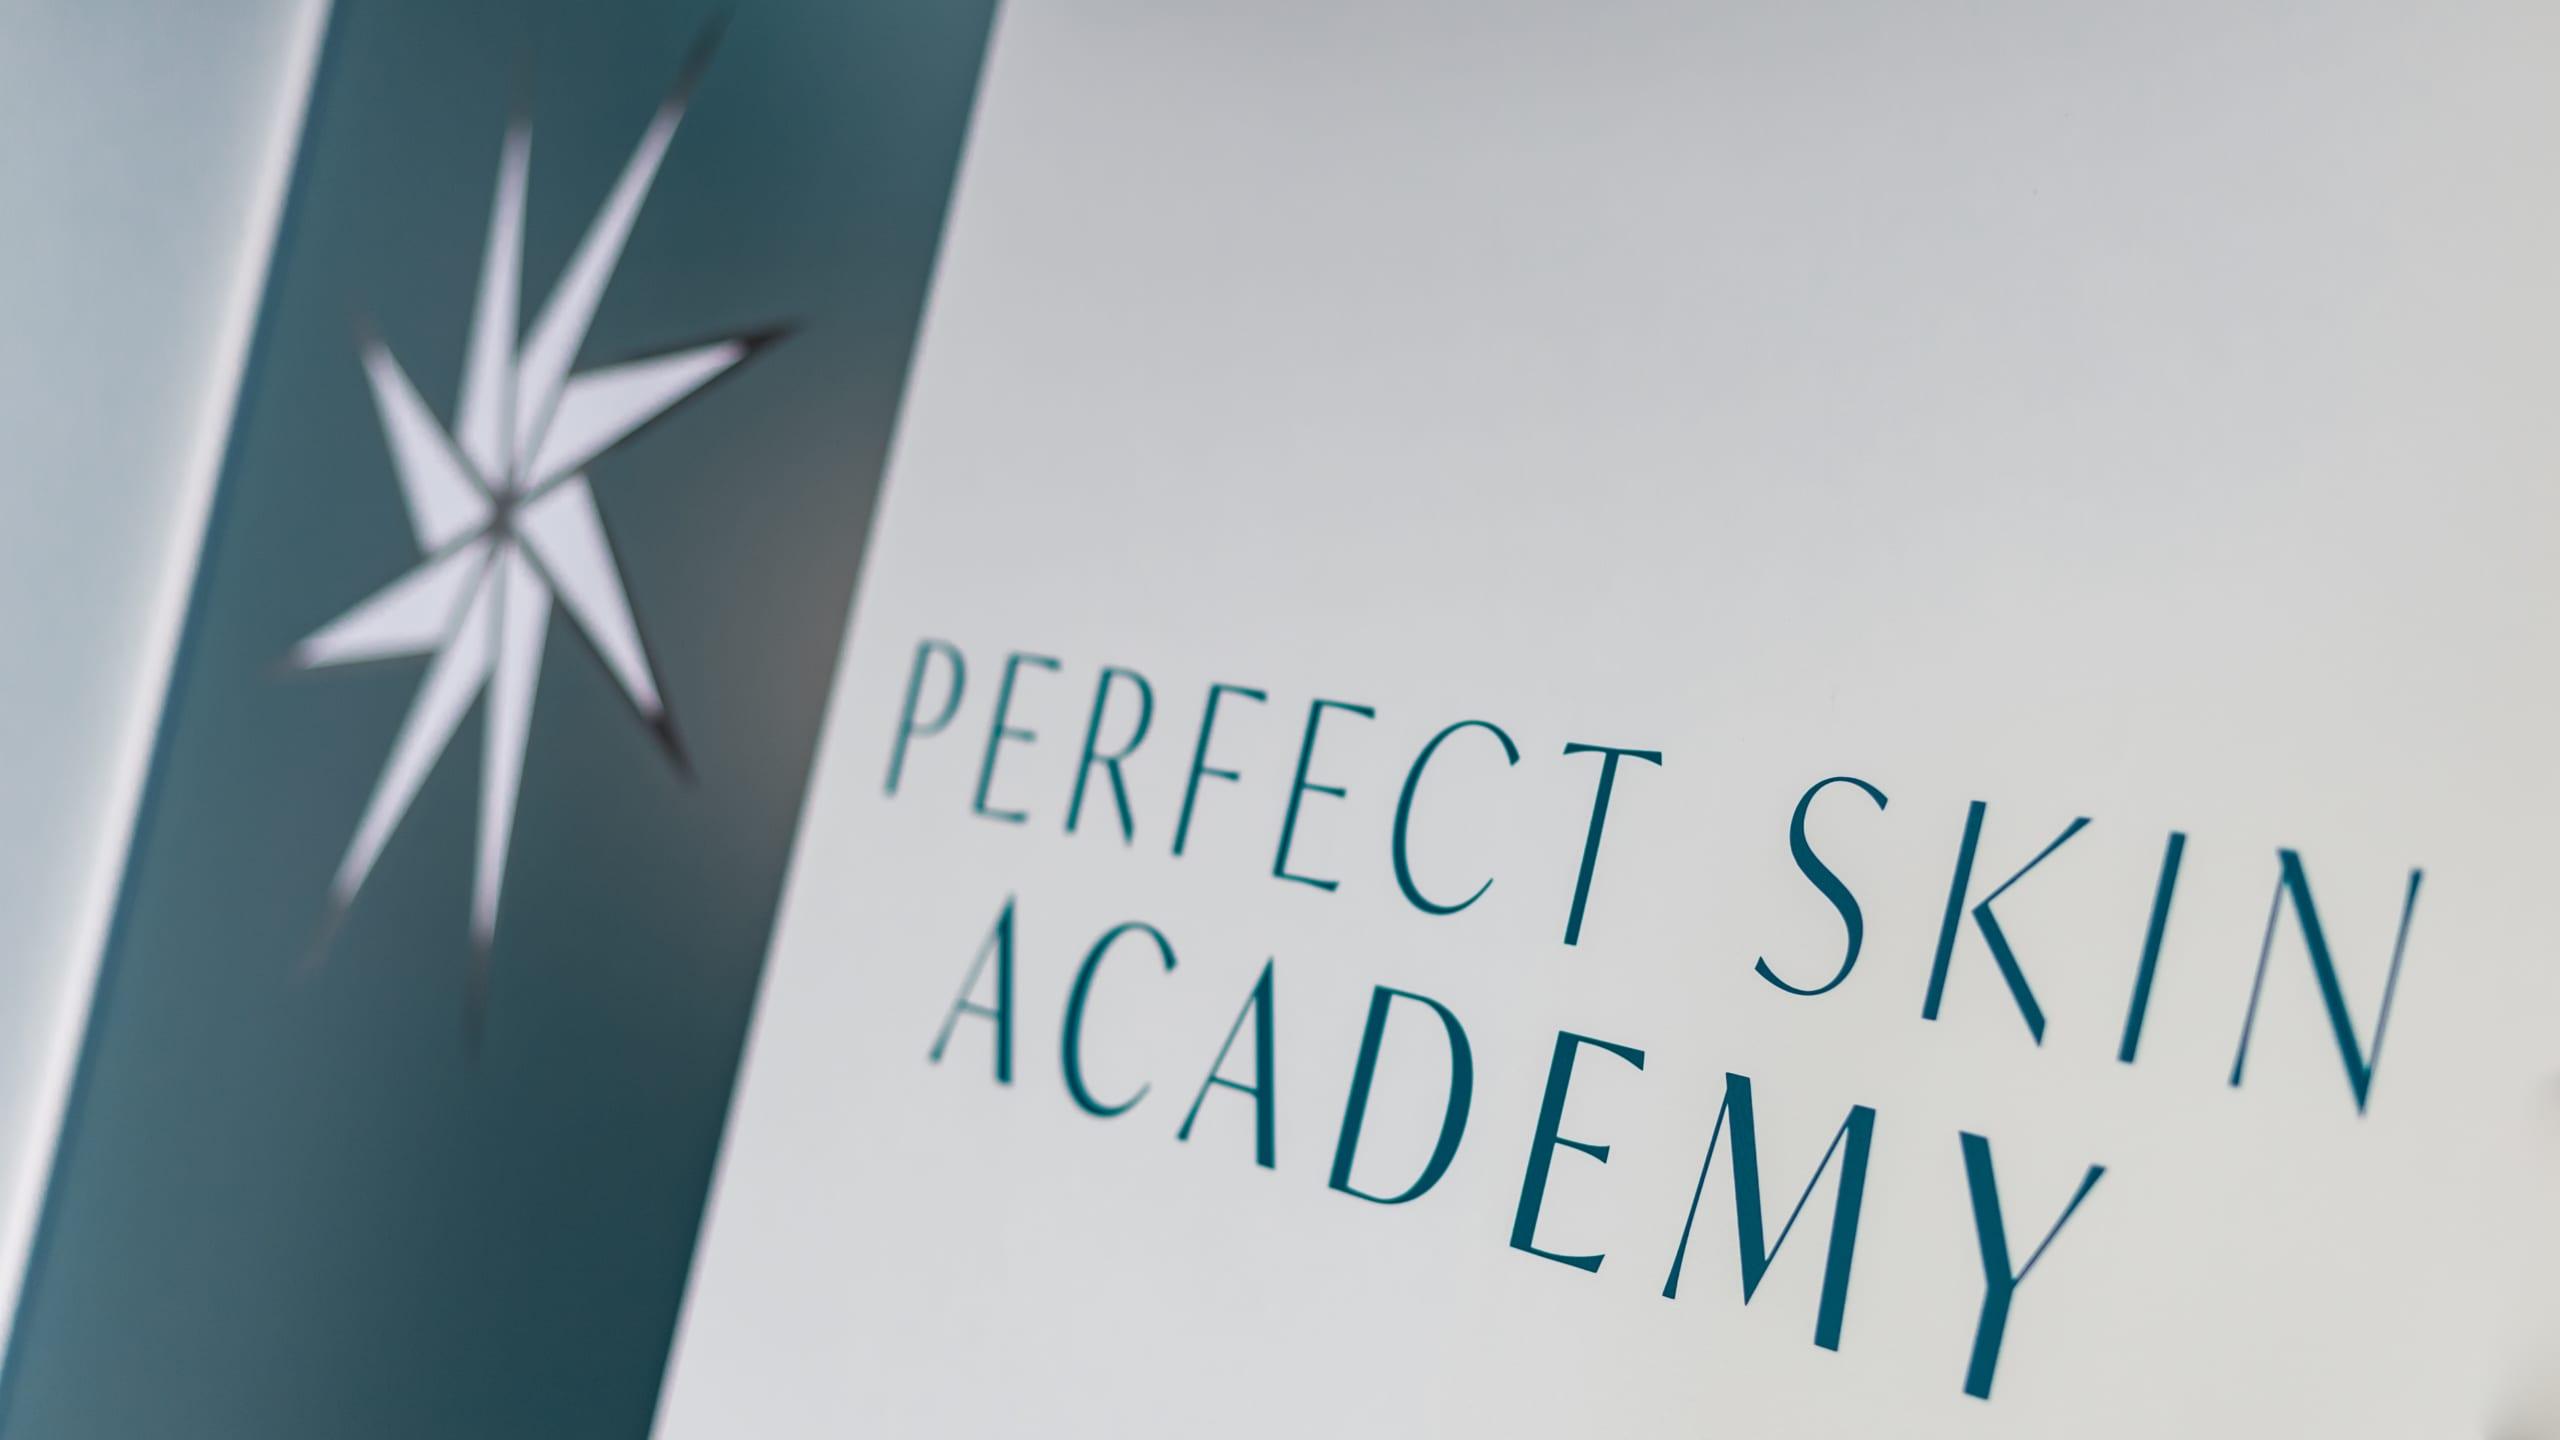 Perfect Skin Academy logo